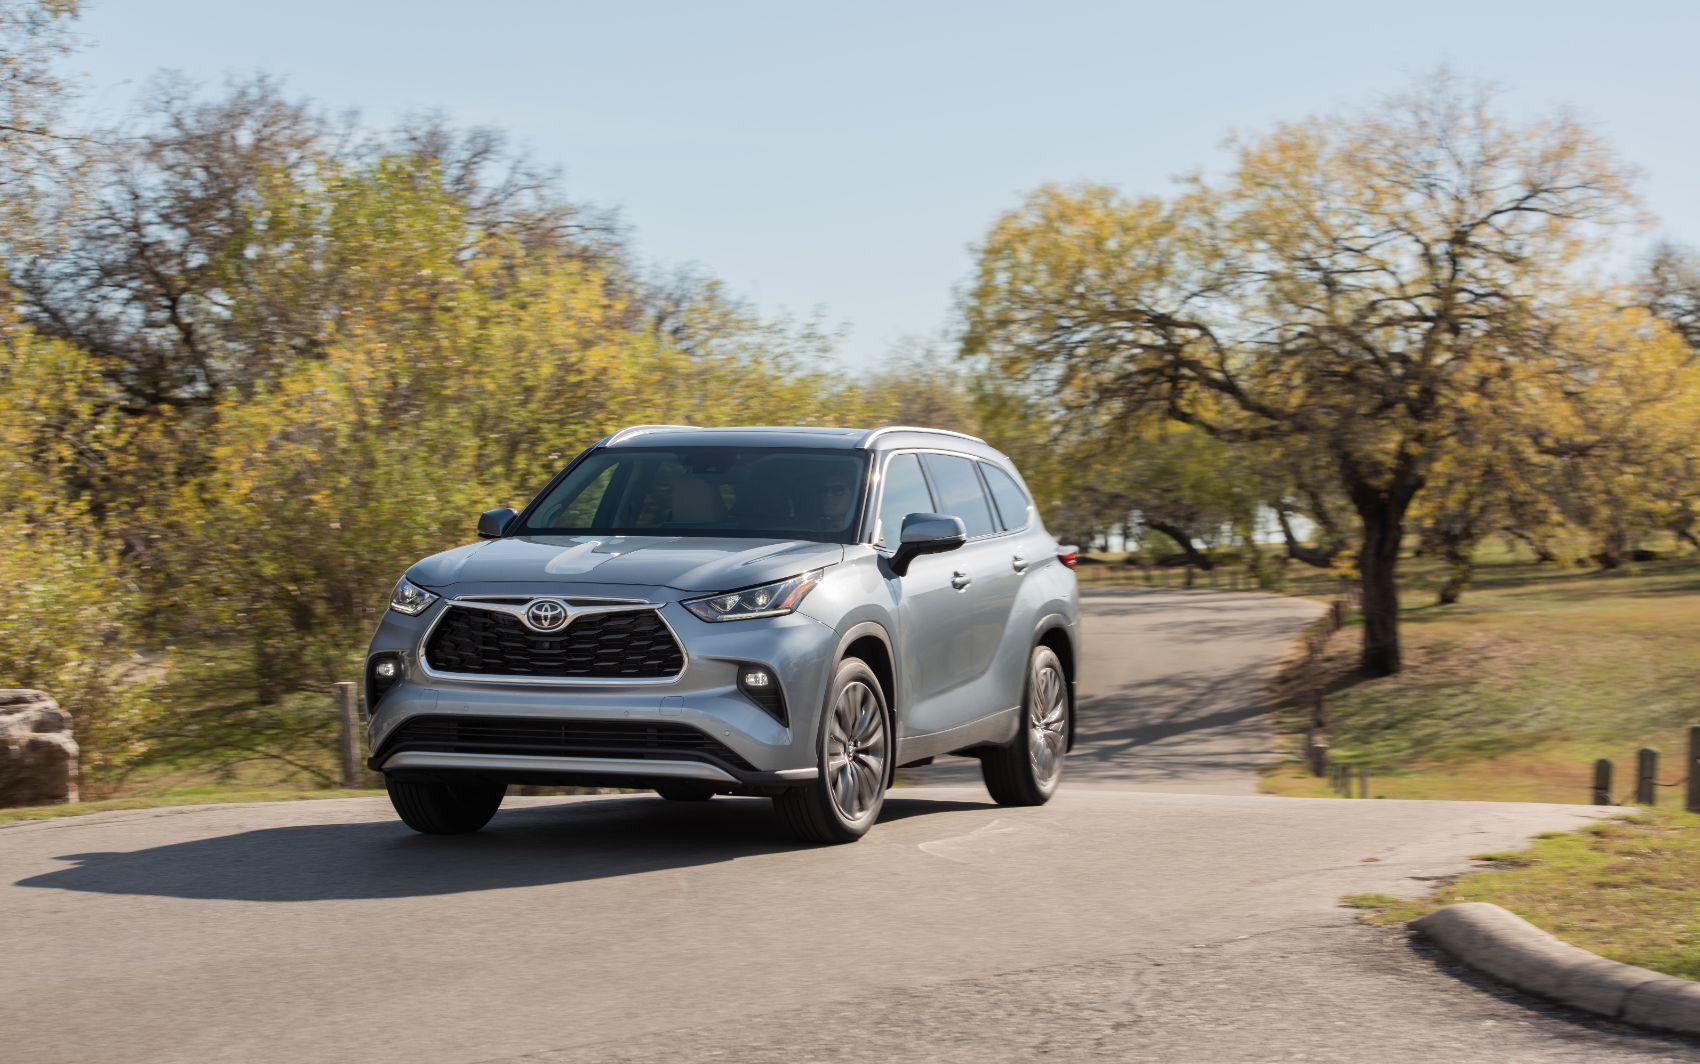 2020 Toyota Highlander Platinum Review: Should You Consider This Three-Row Family Hauler?